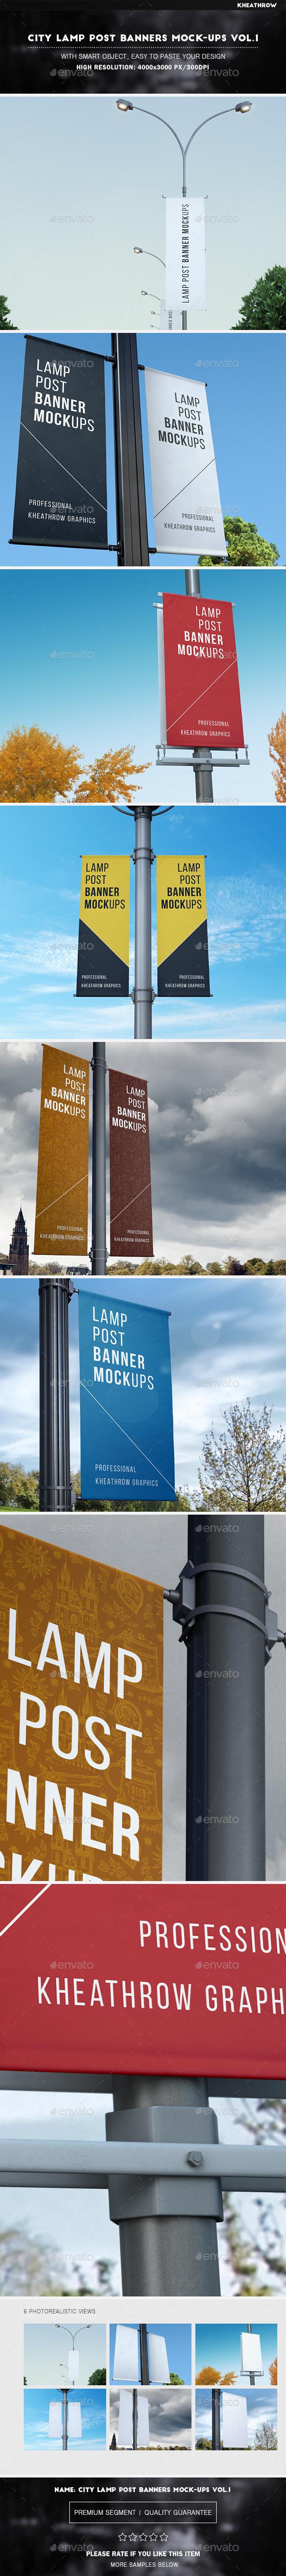 City Lamp Post Banners Mock-Ups Vol.1